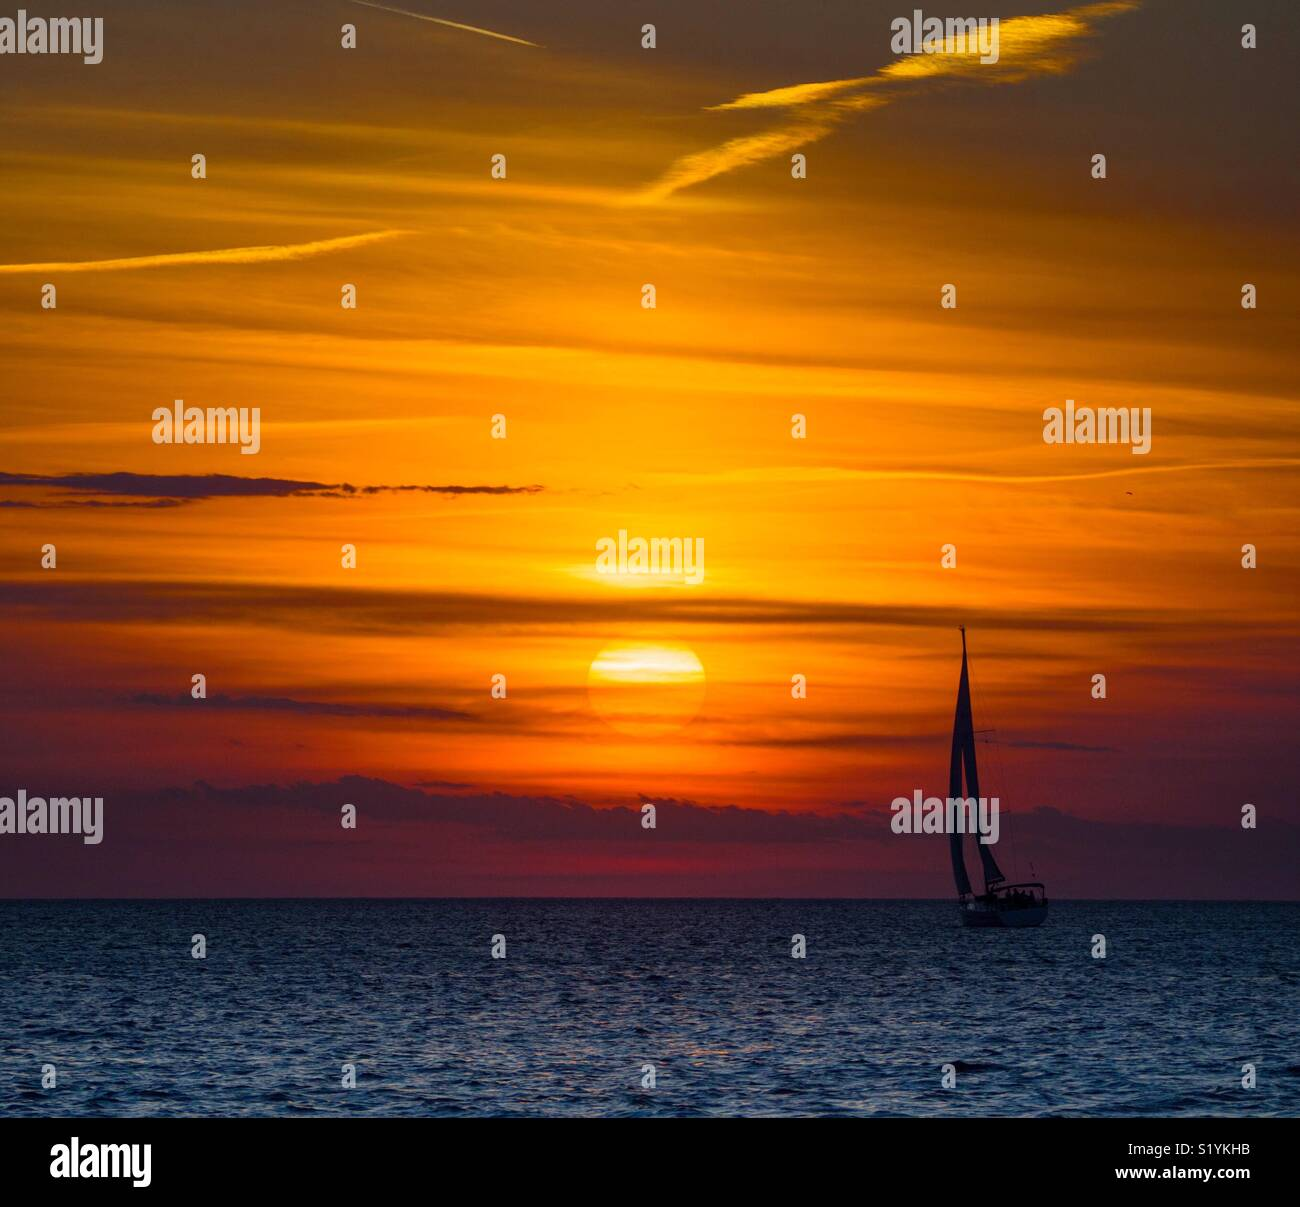 Sunset in Zadar, Croatia - Stock Image